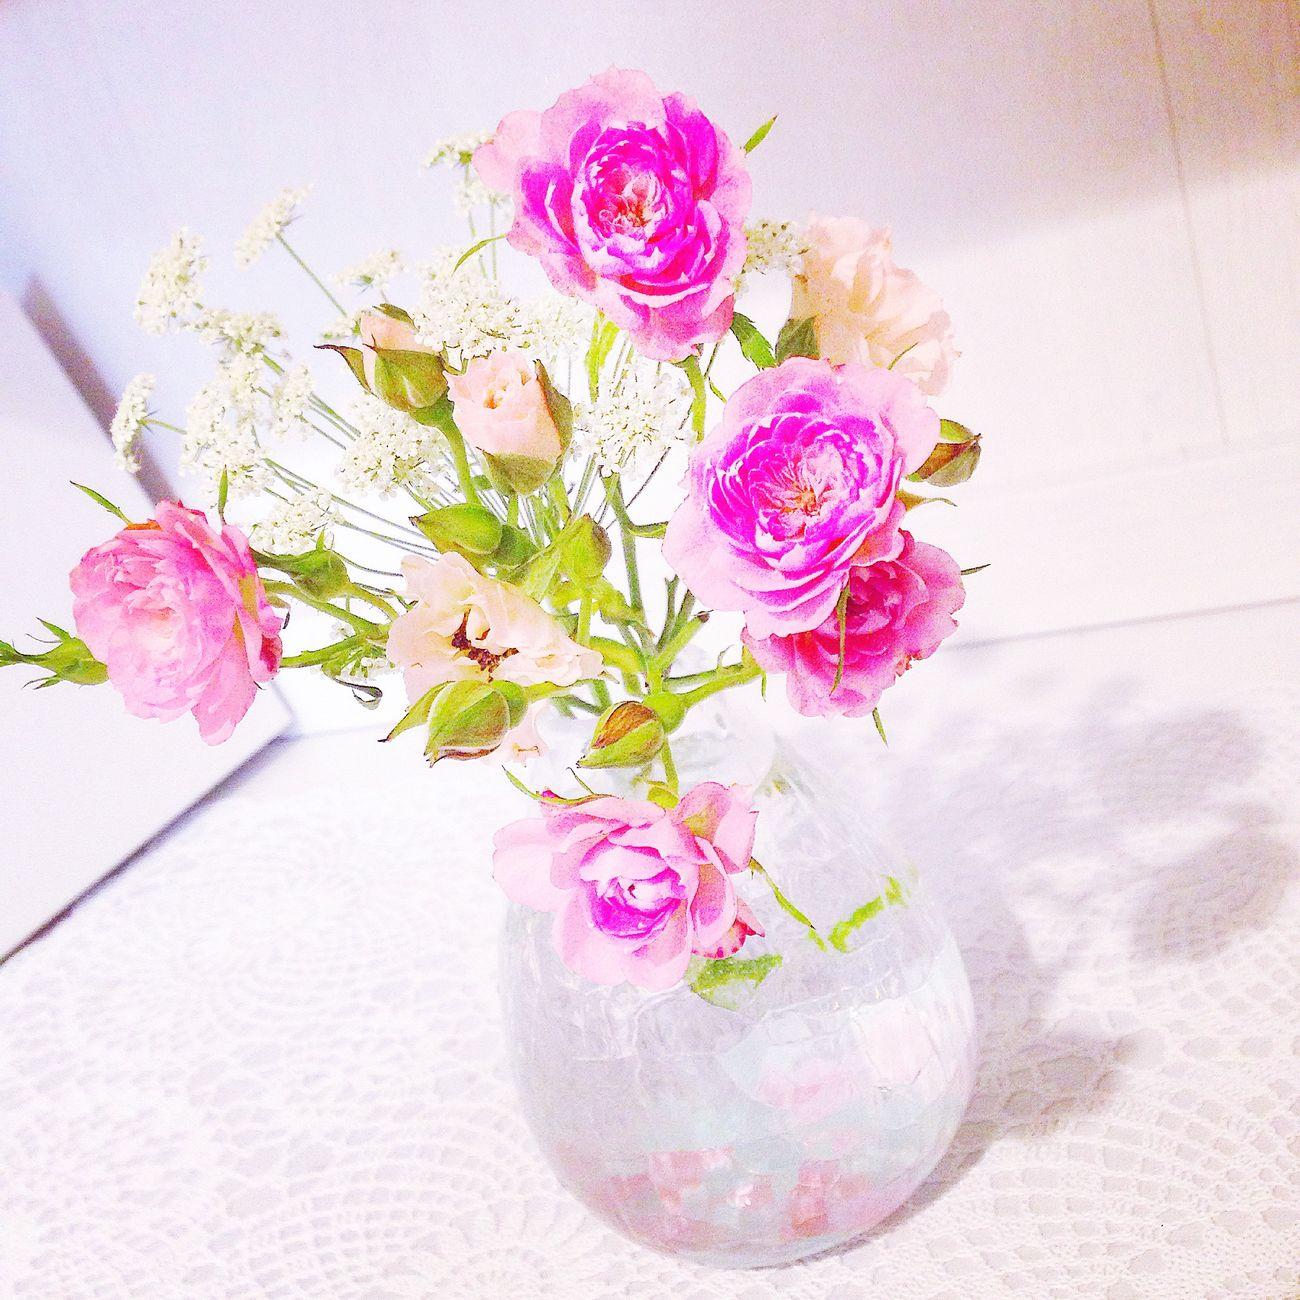 Flower Une Fleur Oeillet Carnation 花 Handmade Flower Vase Vase